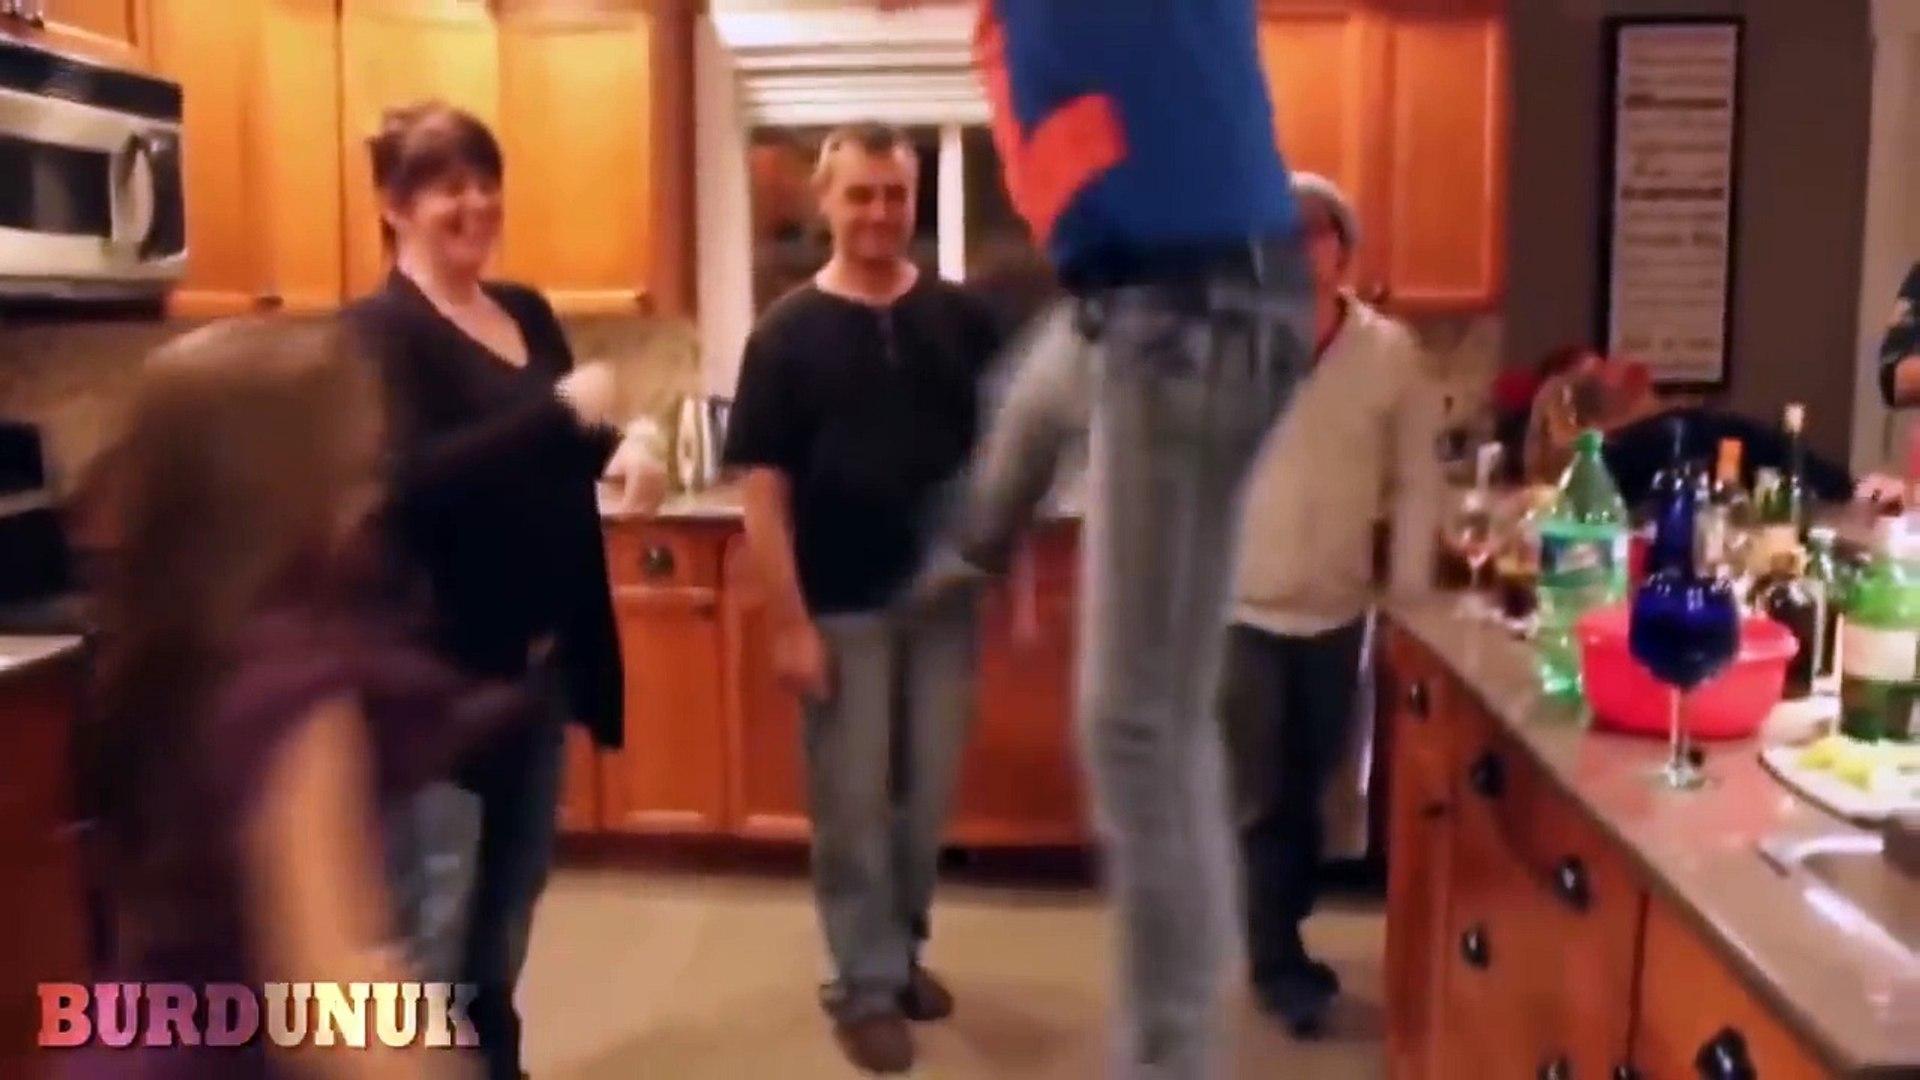 Video Lucu Cewek Hot Kocak Konyol & Bodoh 2016 ○ Pasti